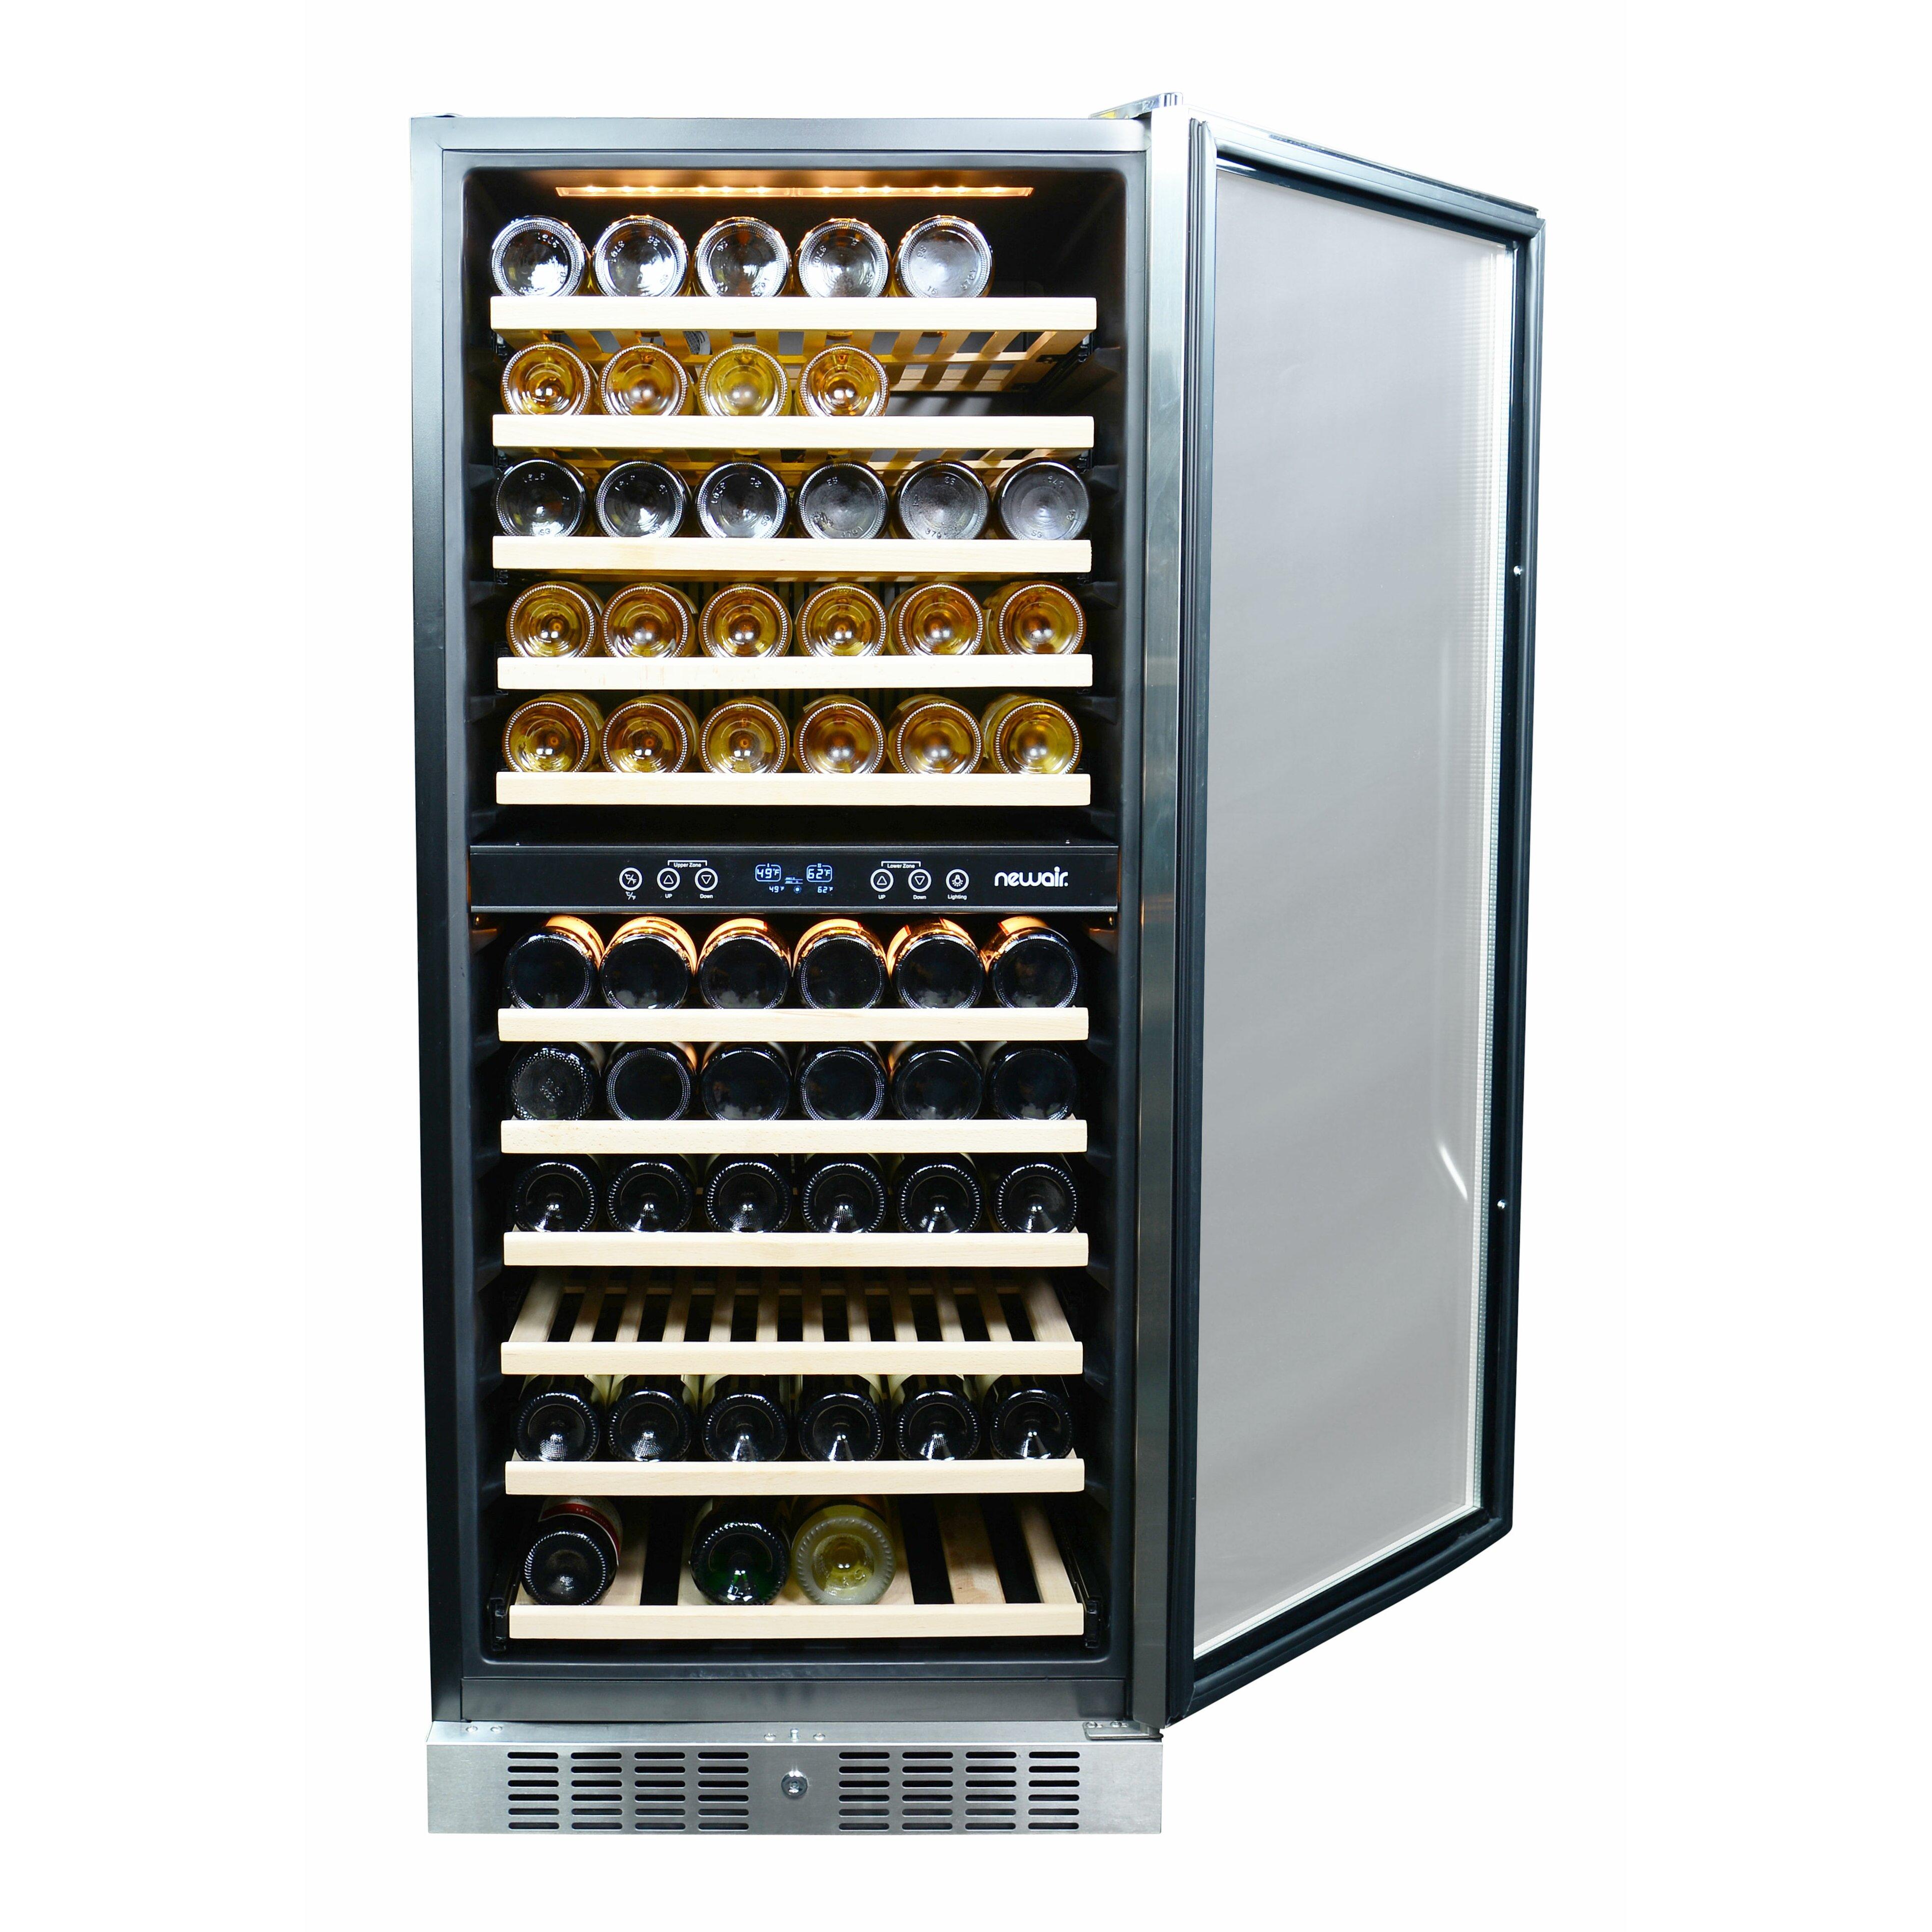 newair 116 bottle dual zone built in wine refrigerator reviews wayfair. Black Bedroom Furniture Sets. Home Design Ideas